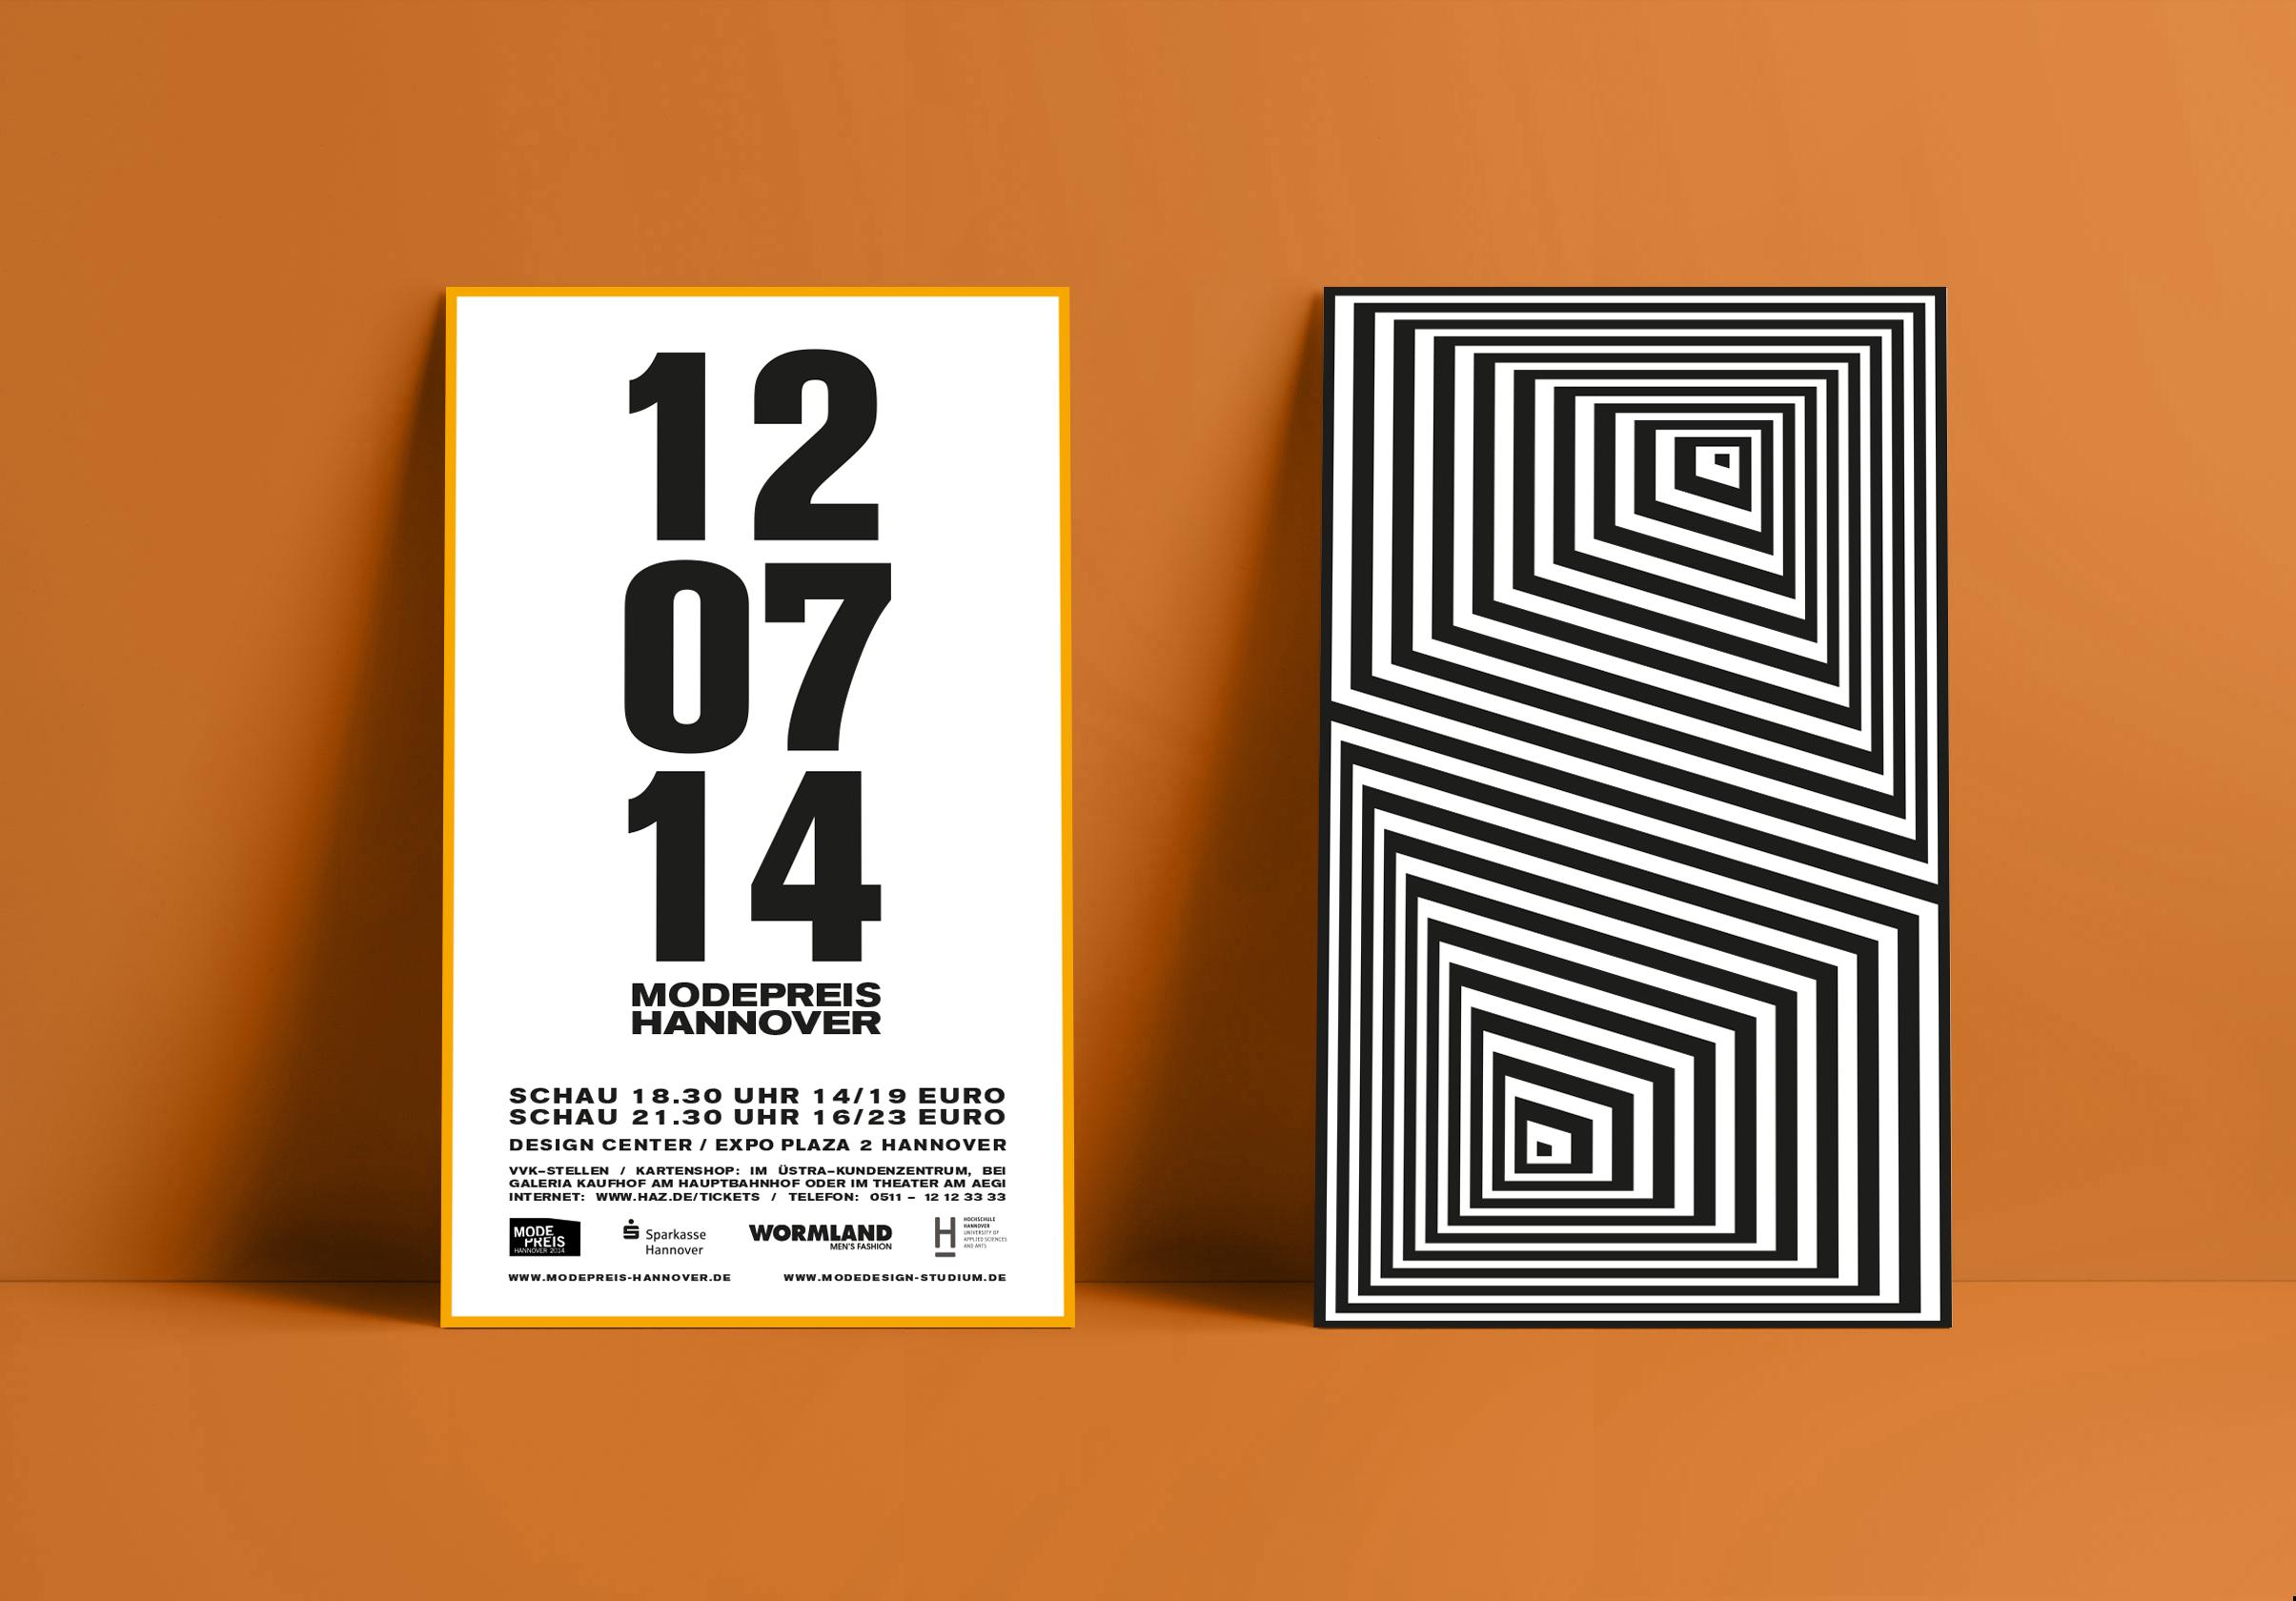 Corporate Design, Brandig, Event Design, Modepreis Hannover Flyer | Freelancer Grafik Design Berlin